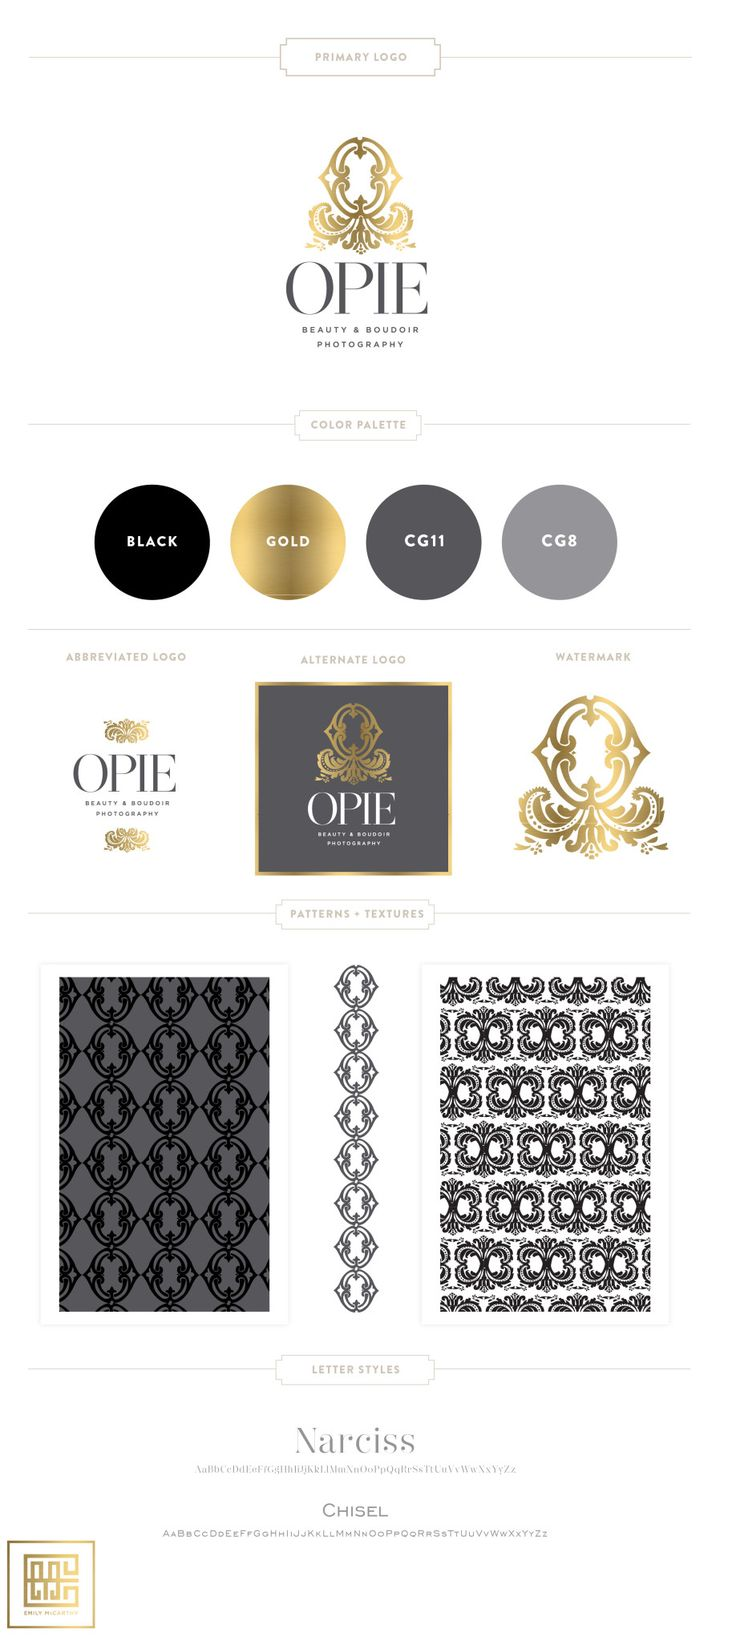 Emily McCarthy Branding Design | Opie Beauty & Boudoir Photography Branding…